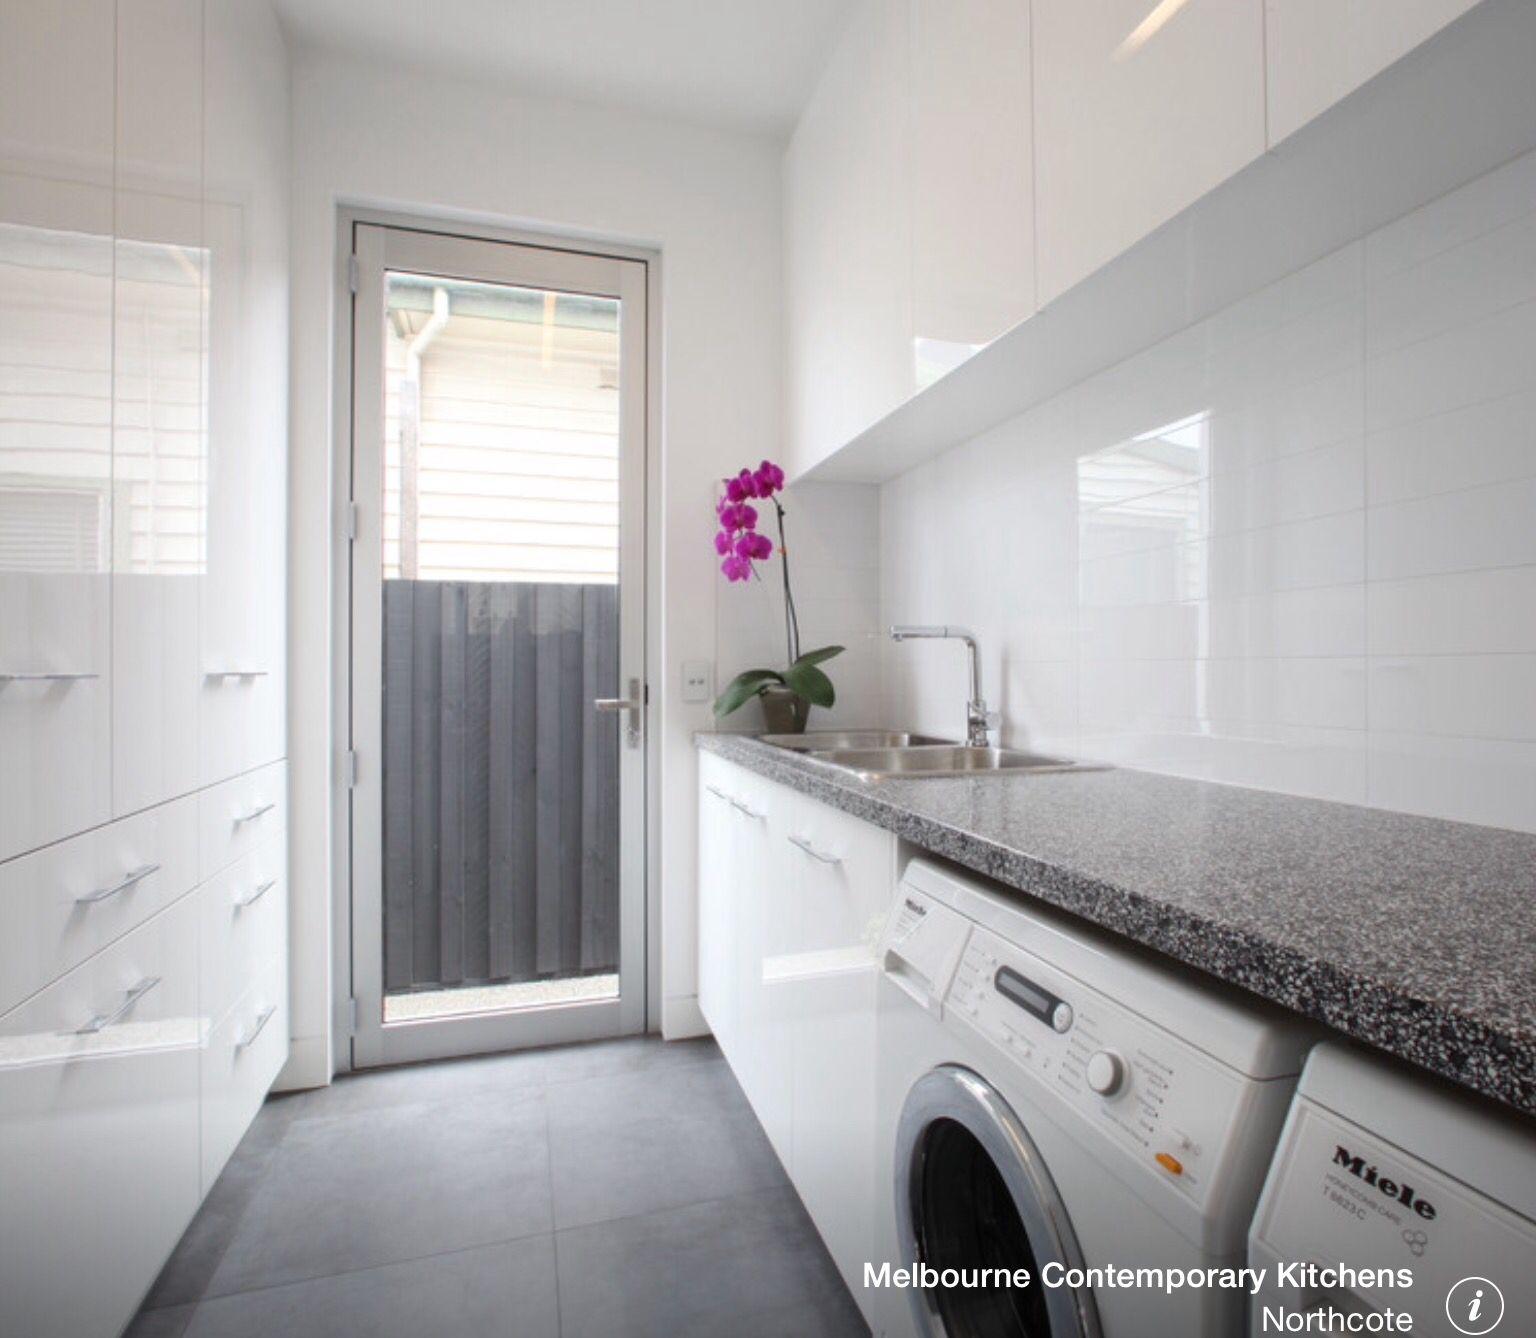 Hartland Kitchen And Laundry Room Remodel: Sink In Corner Under Bench Washer/dryer